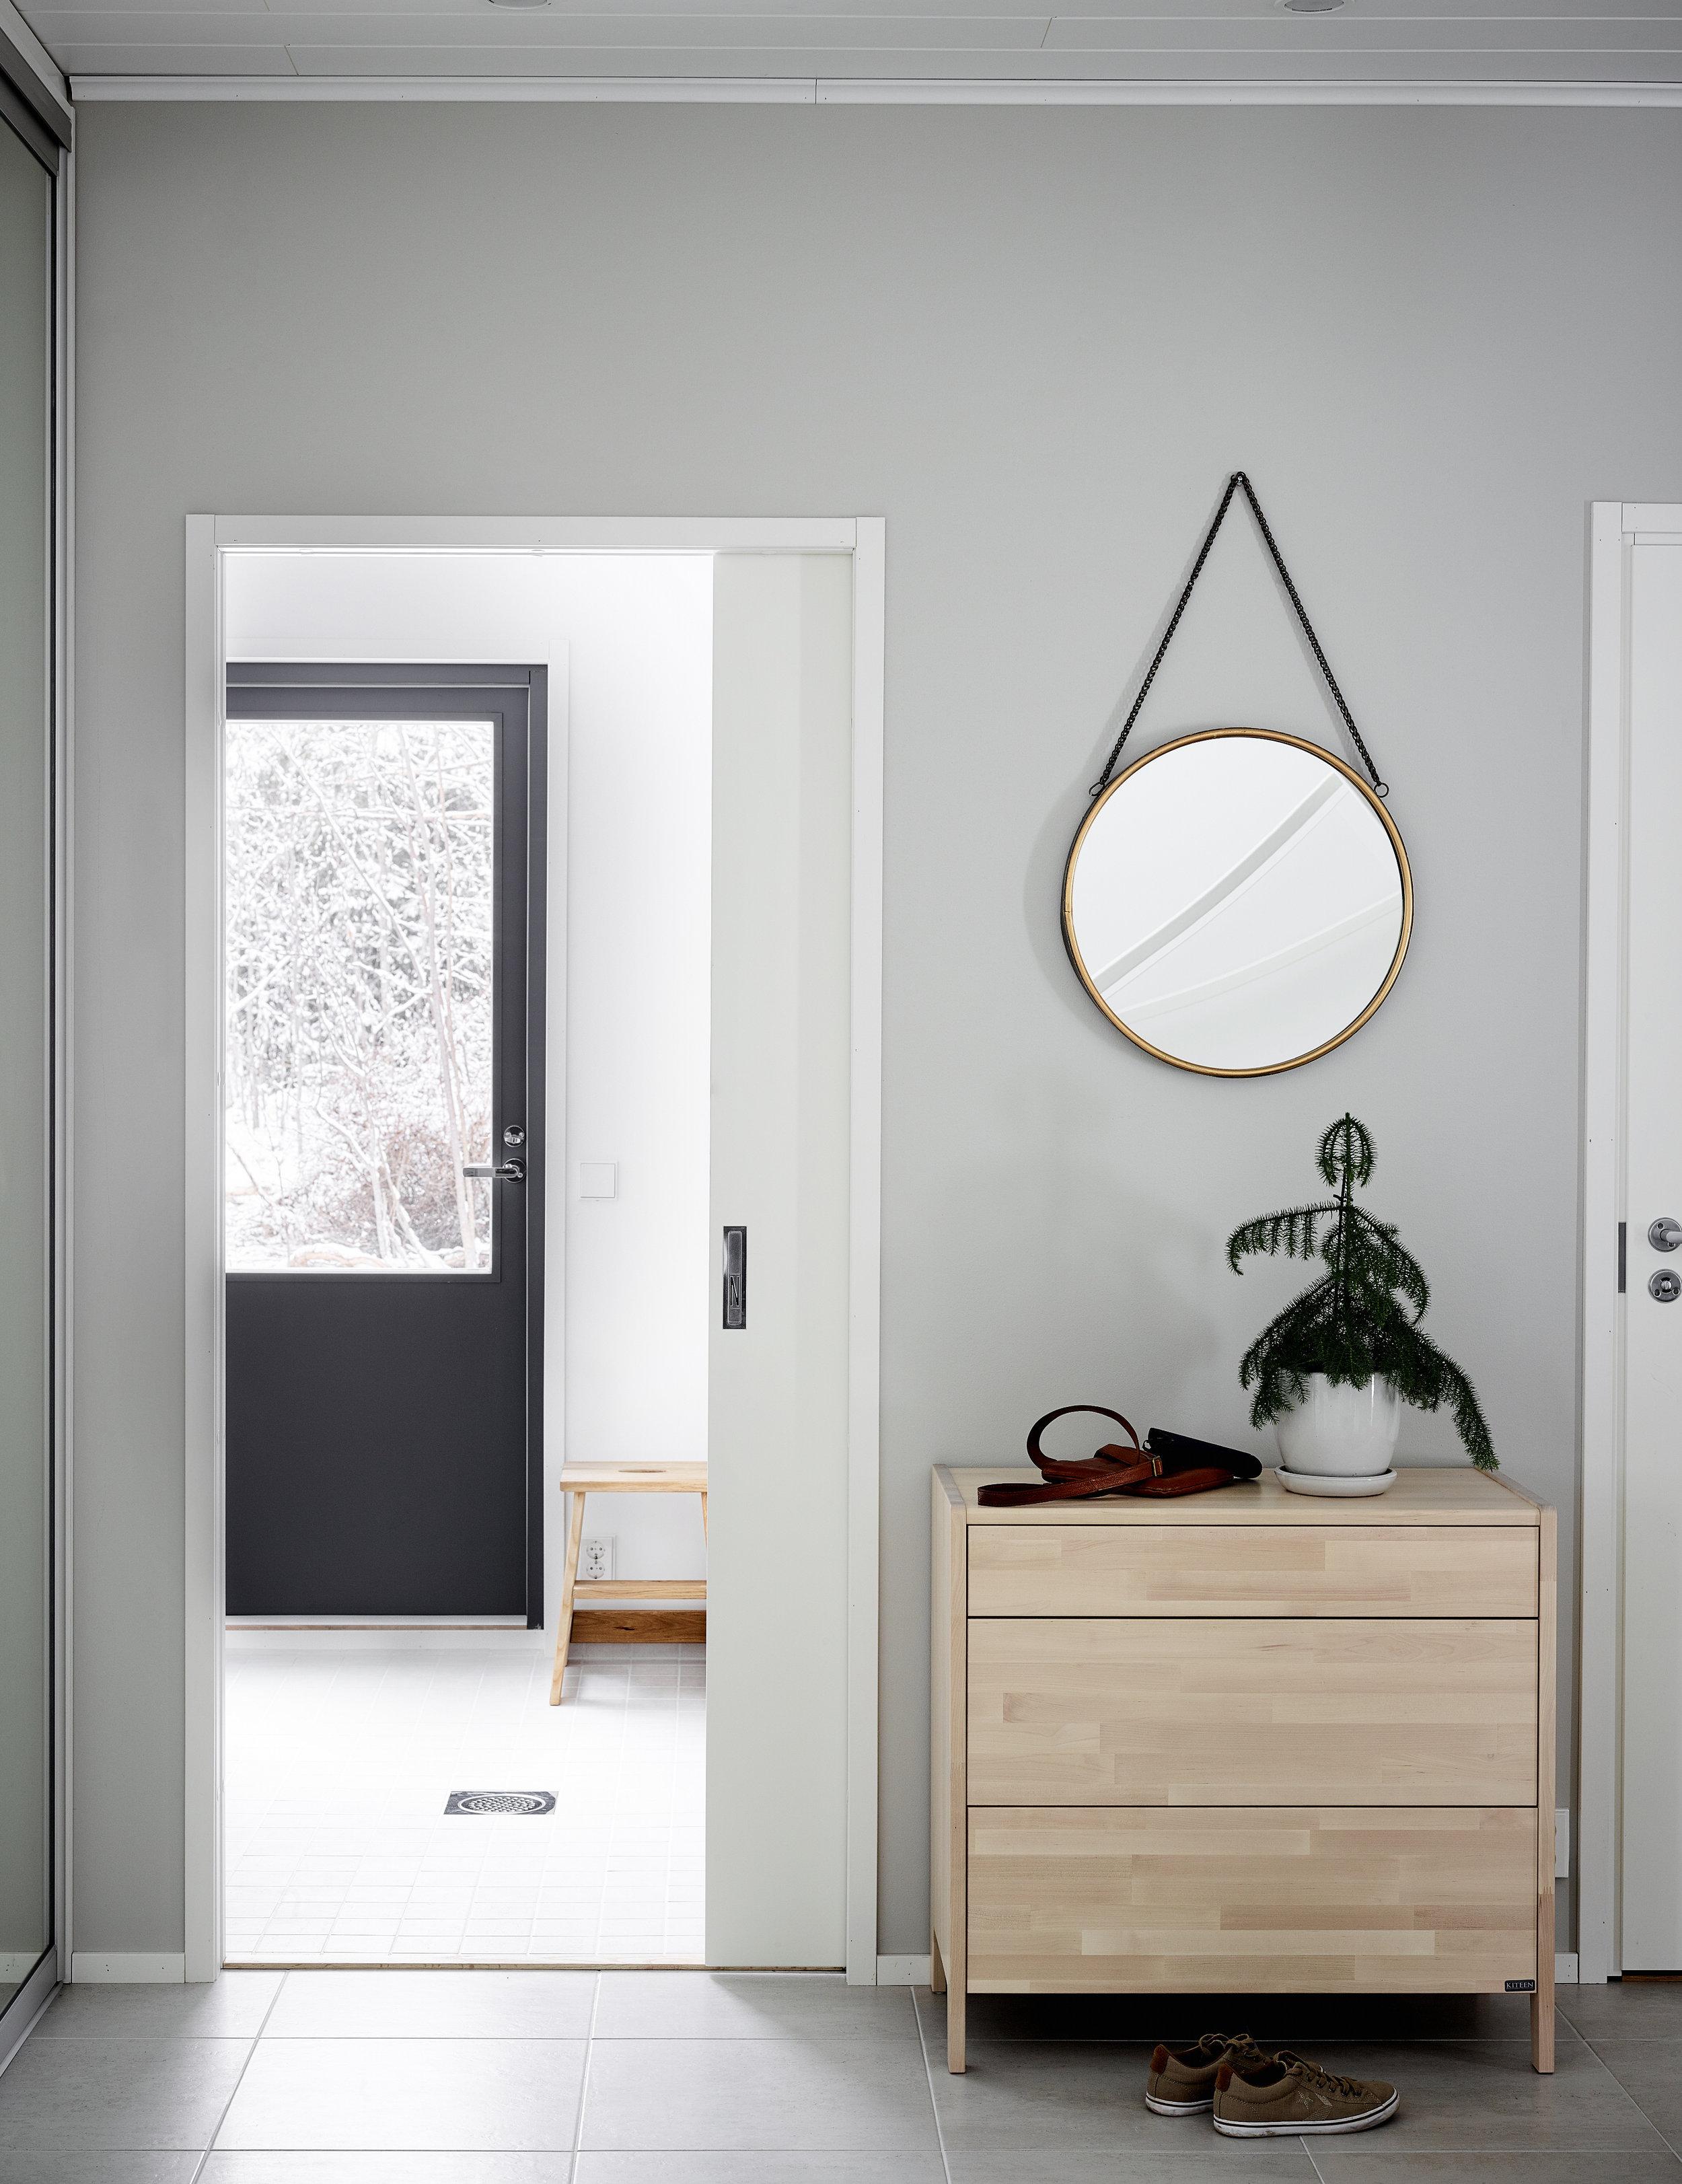 interior-anna-koponen-photo-krista-keltanen-07.jpg